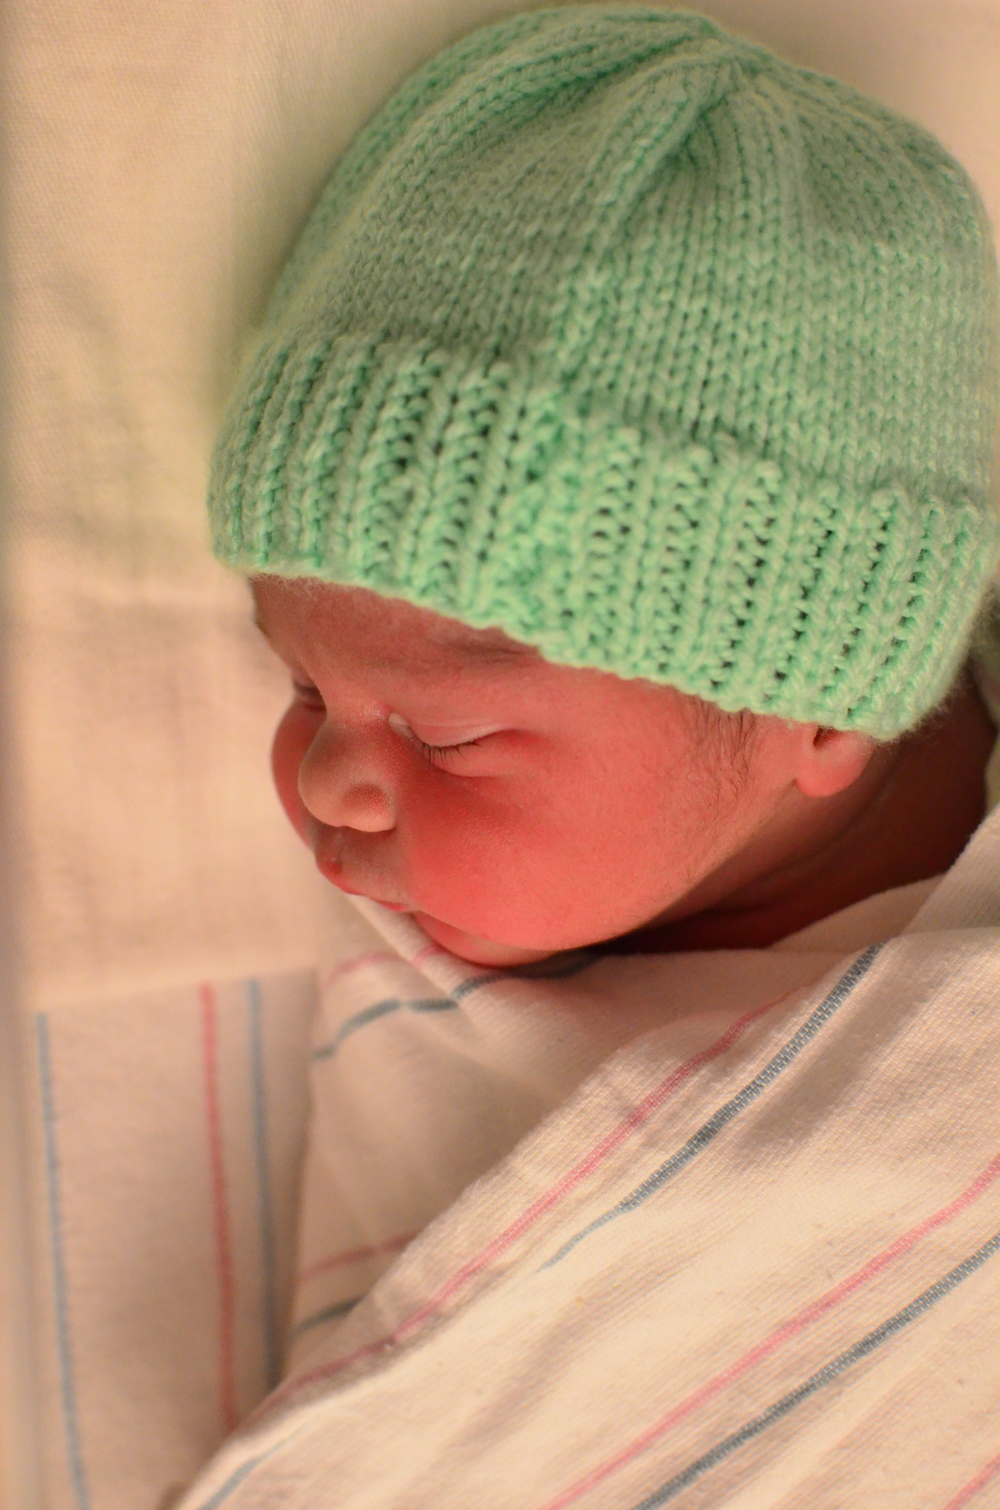 baby_nando_day1_2013 (1 ).jpg